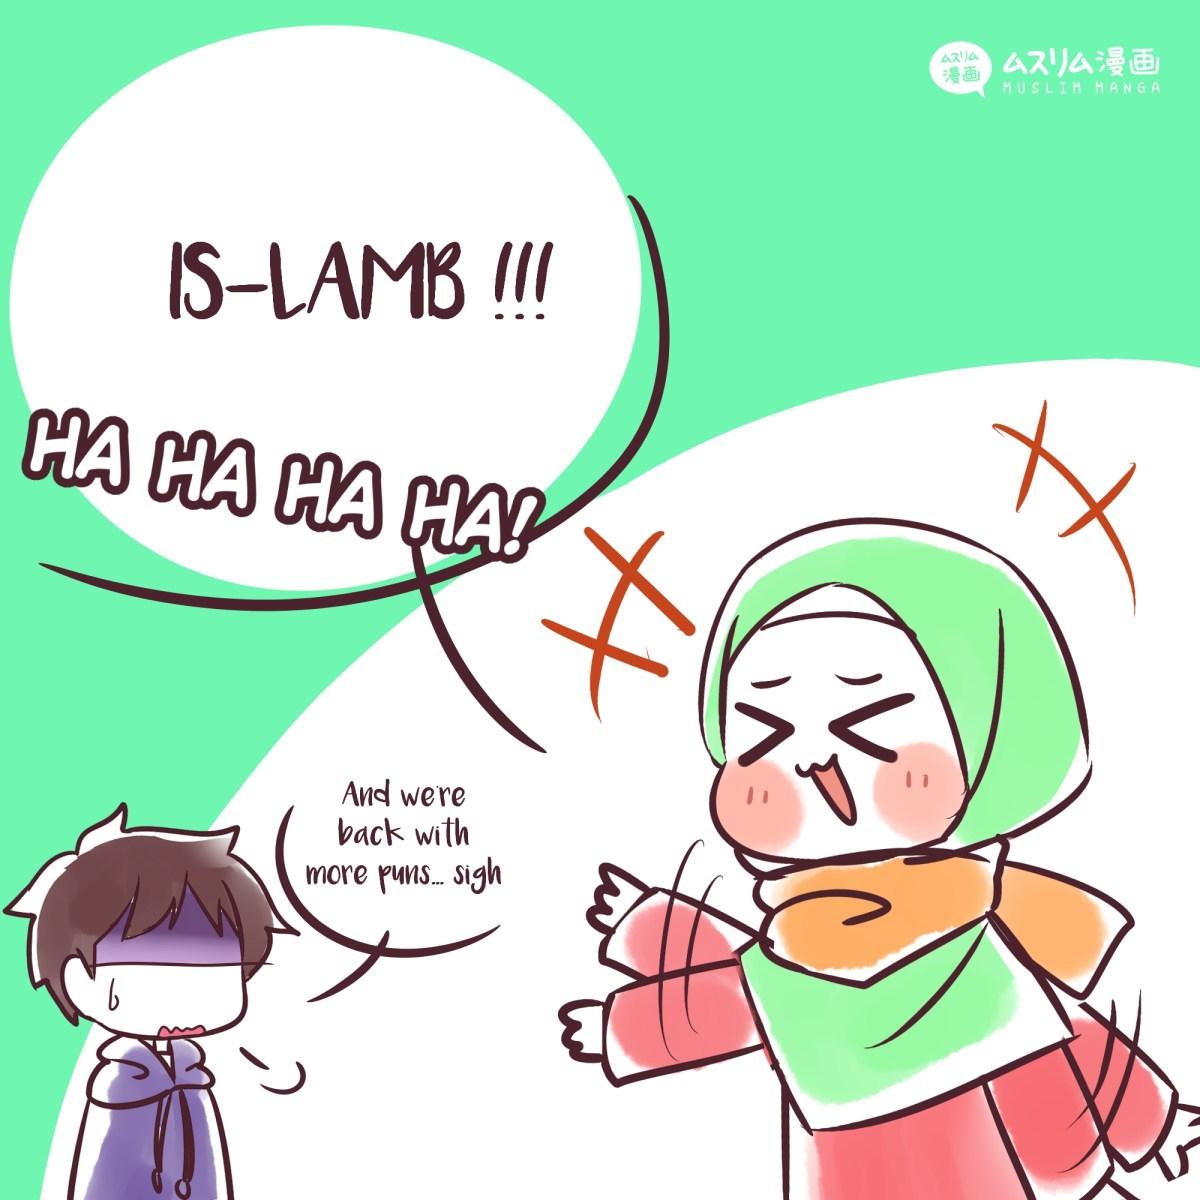 fun puns: islamb 2